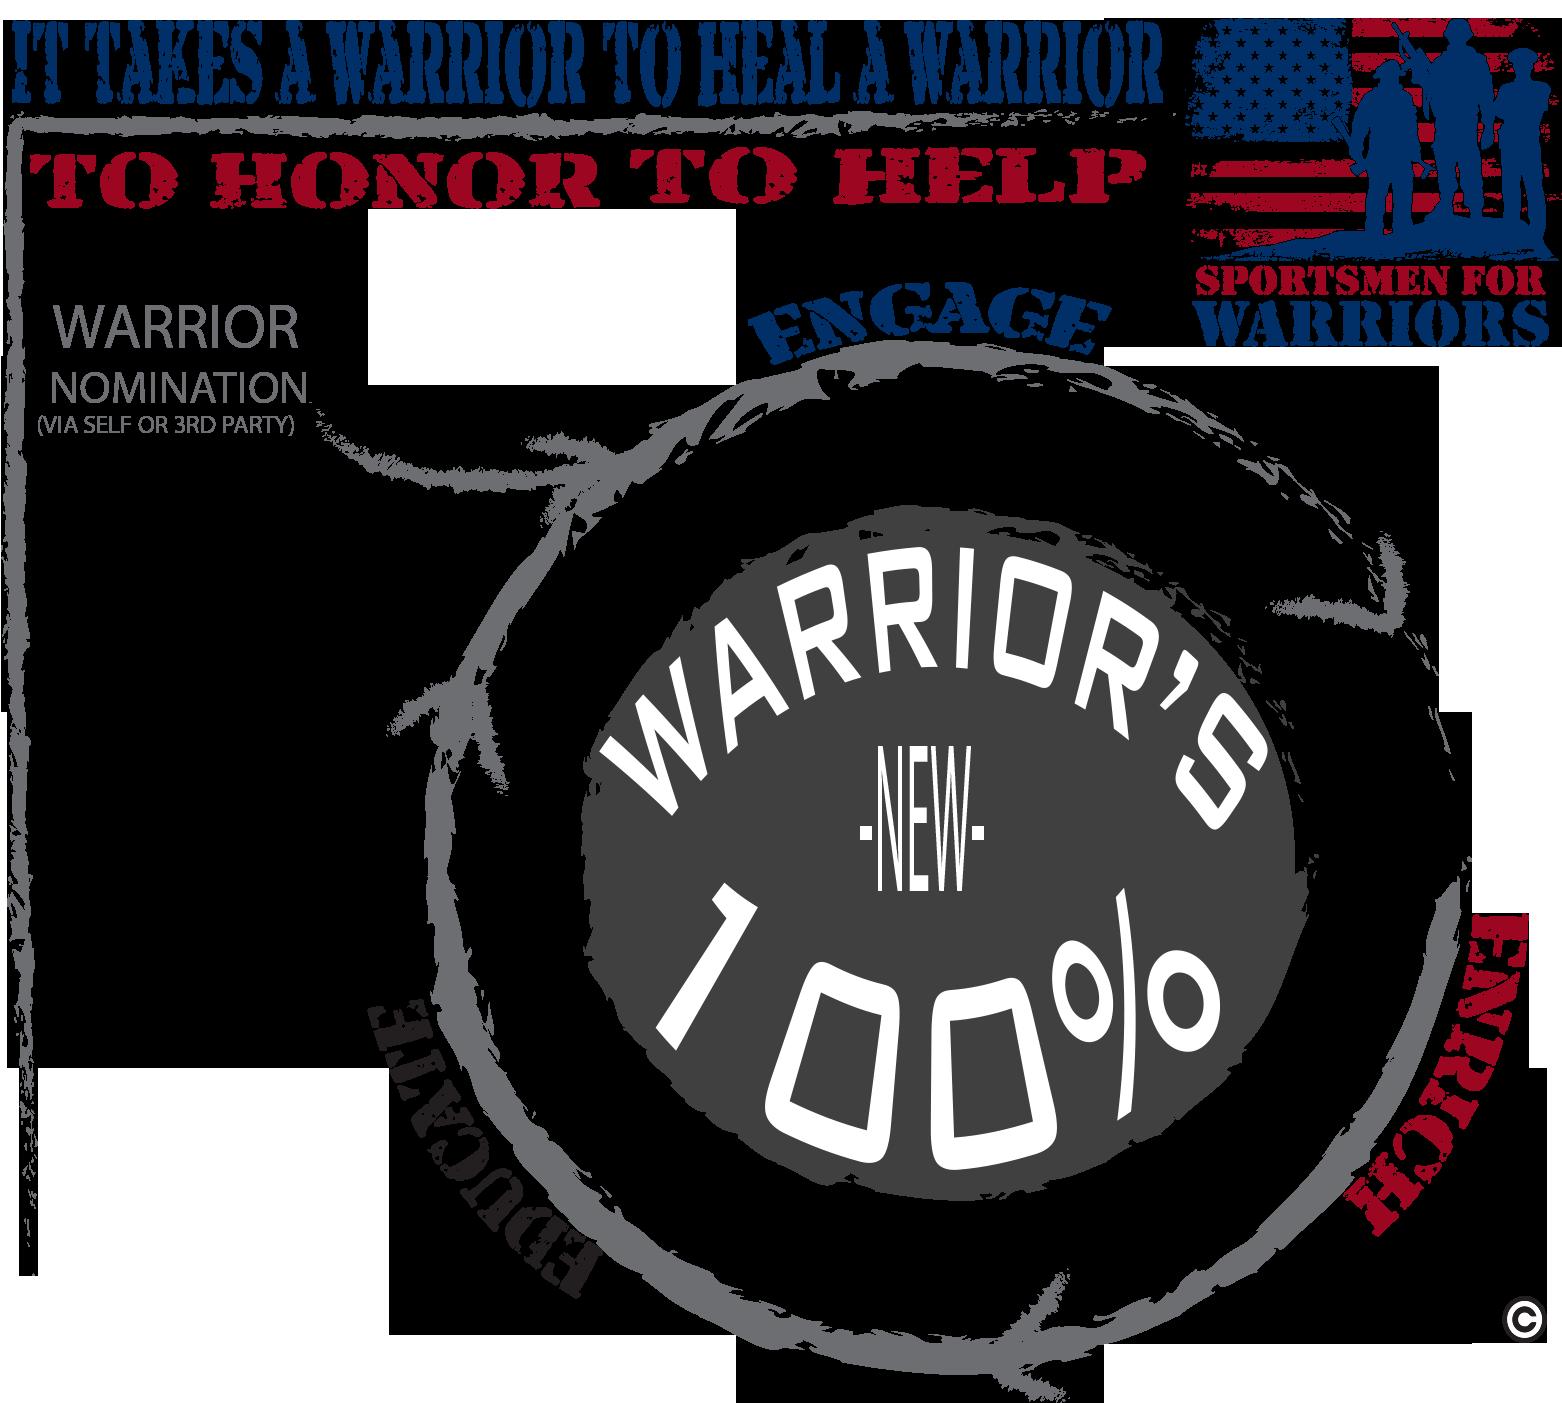 Sportsmen-for-warriors-process.png